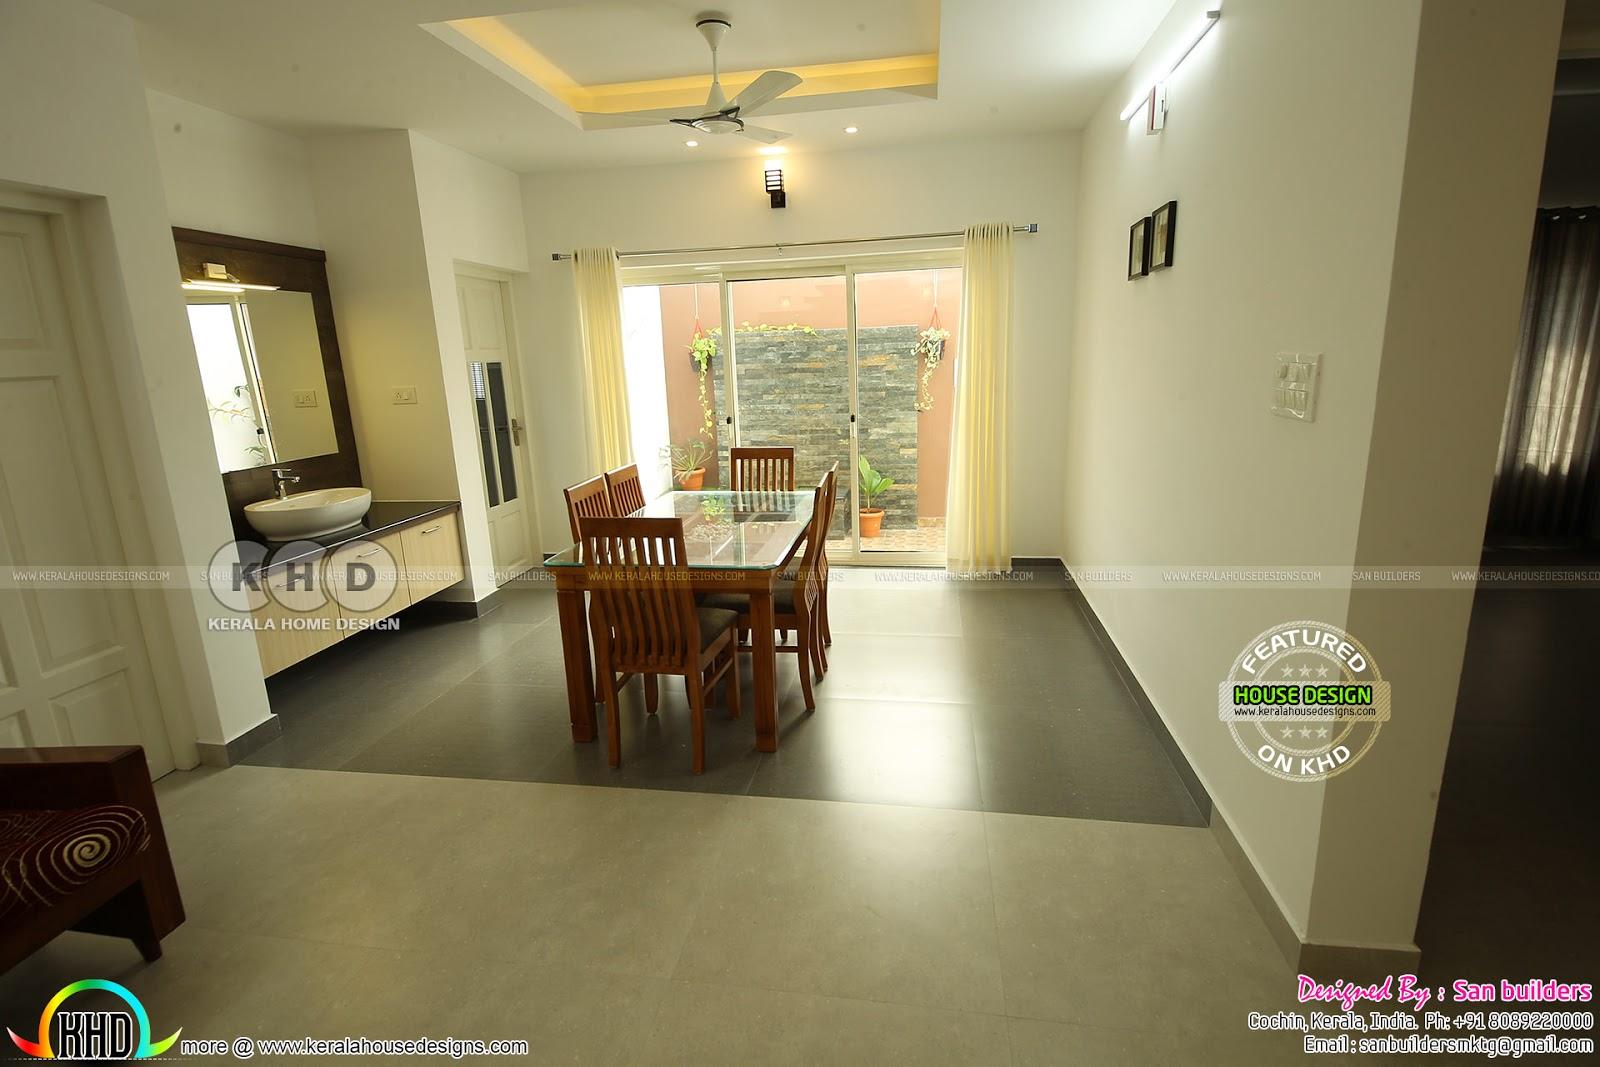 Furnished Single Floor Kerala Home Design 1616 Sq Ft